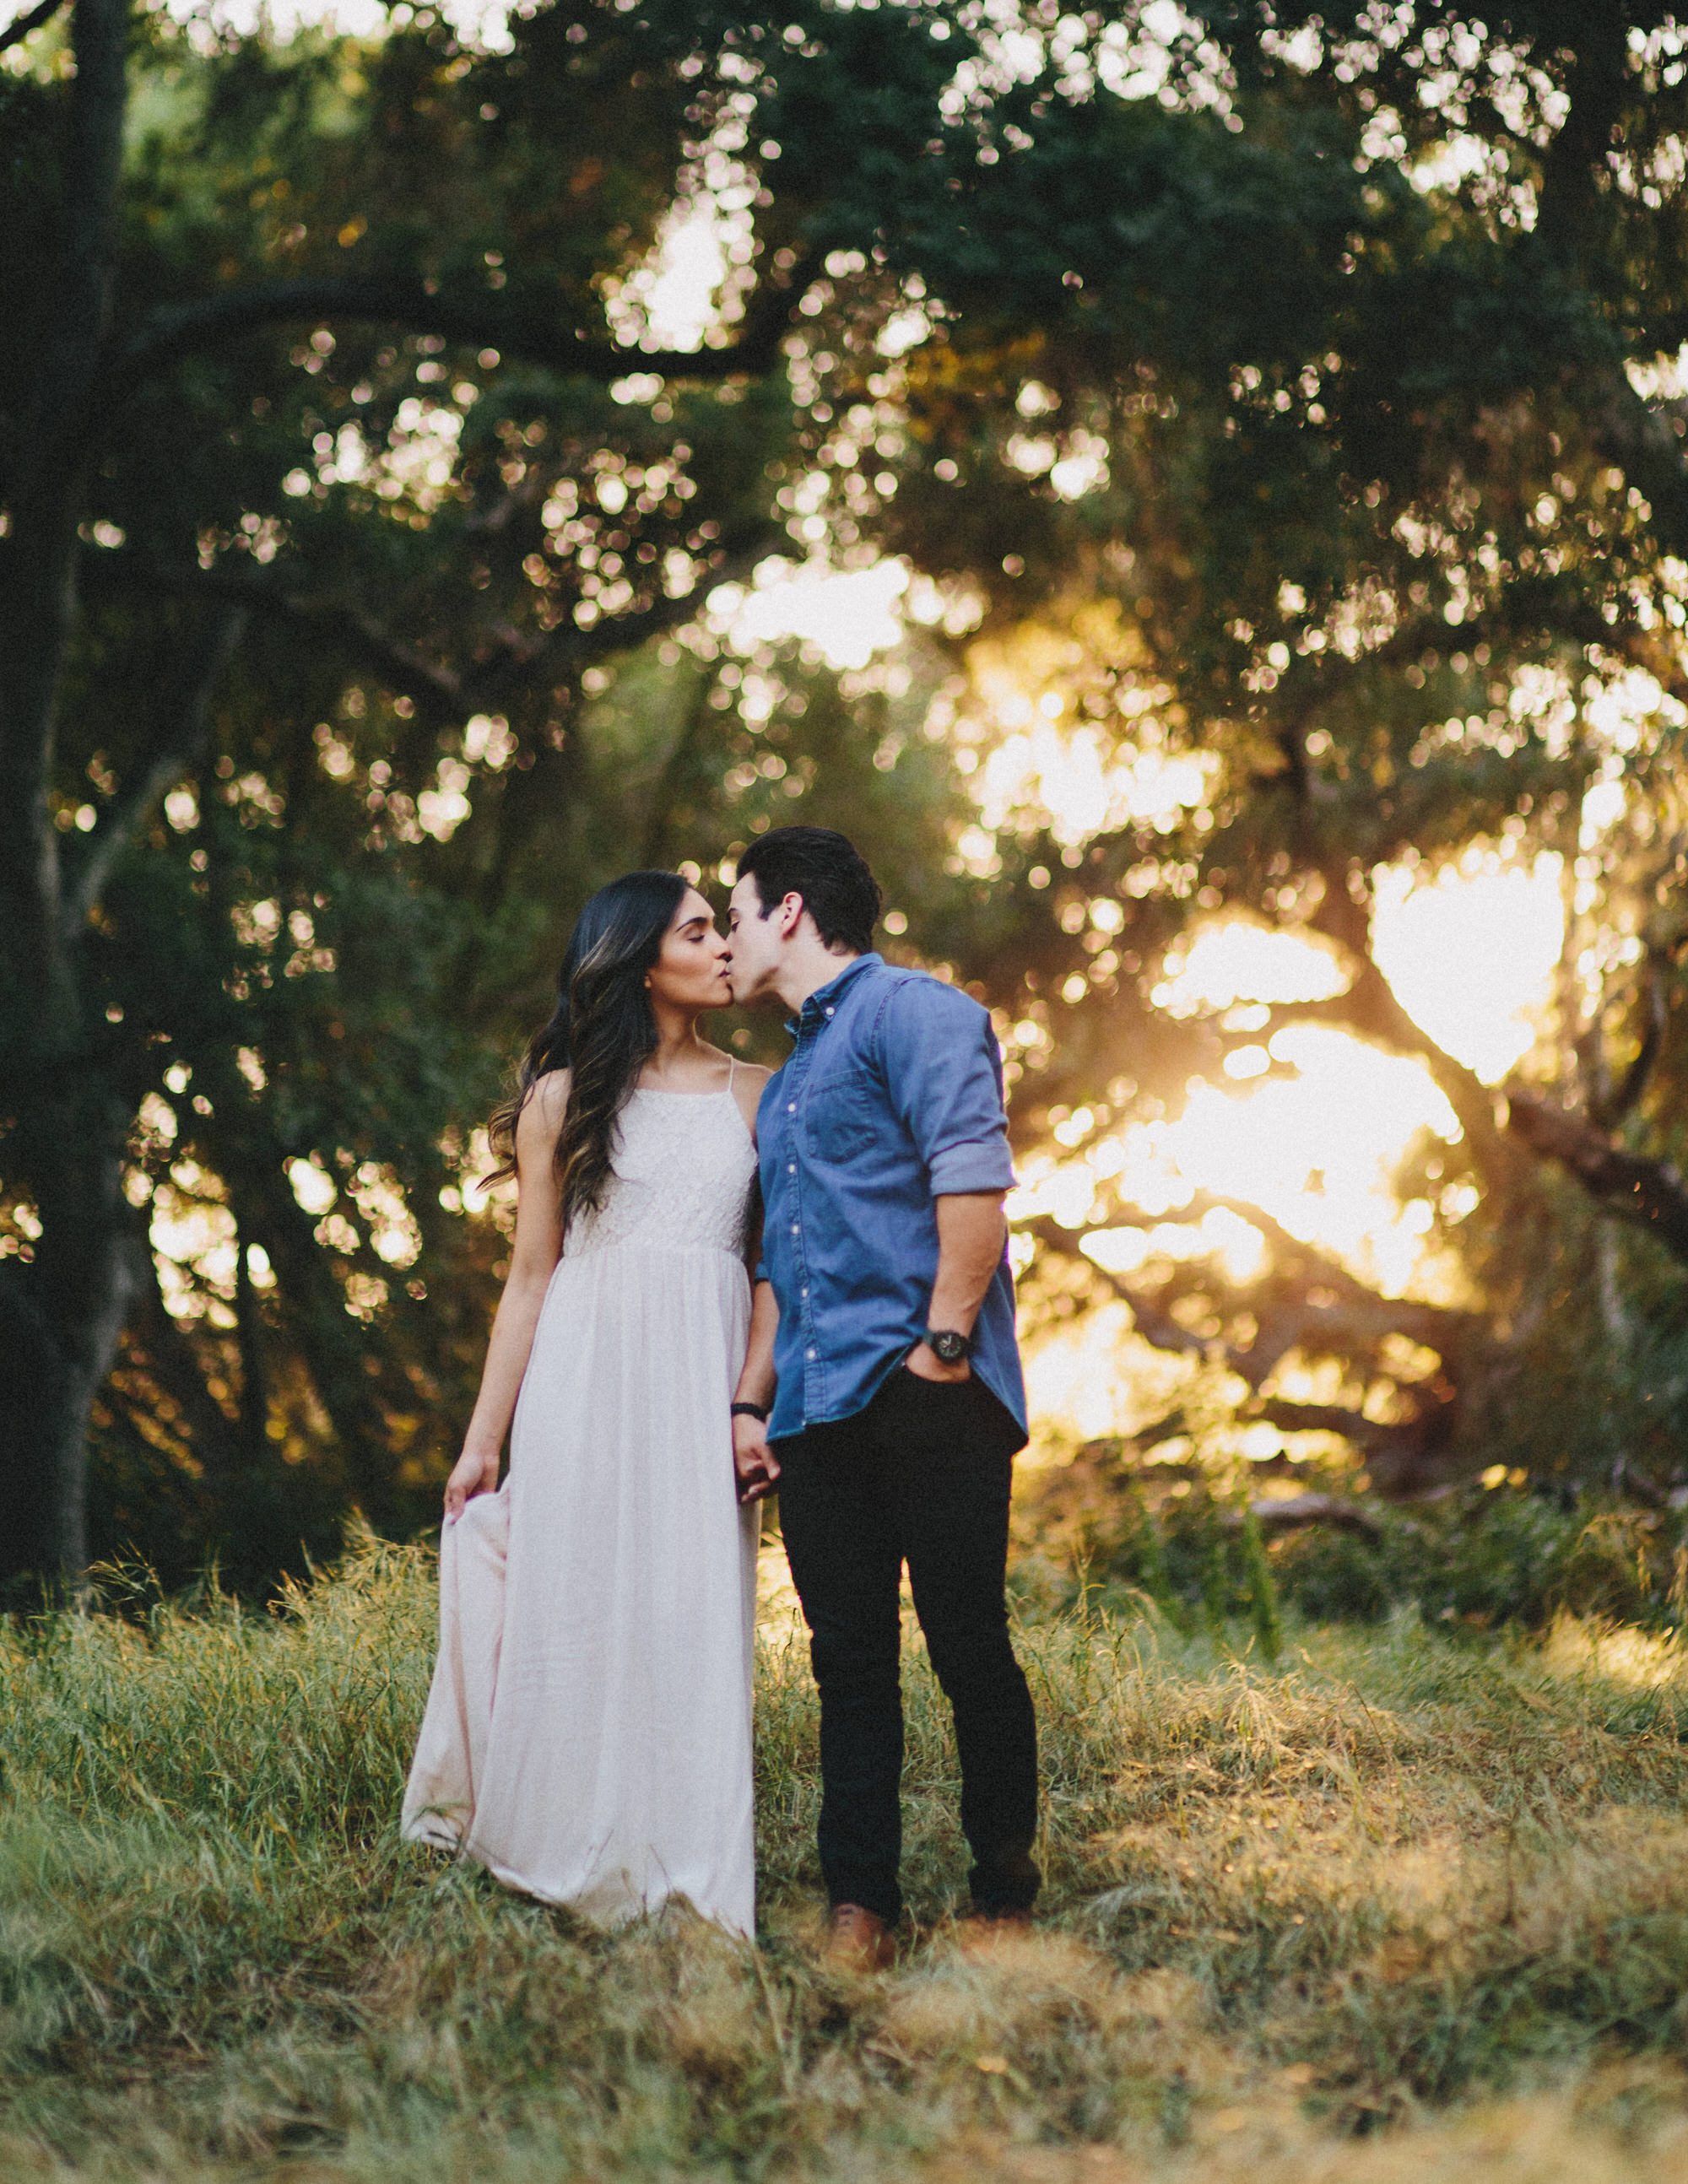 romantic-engagement-16.jpg